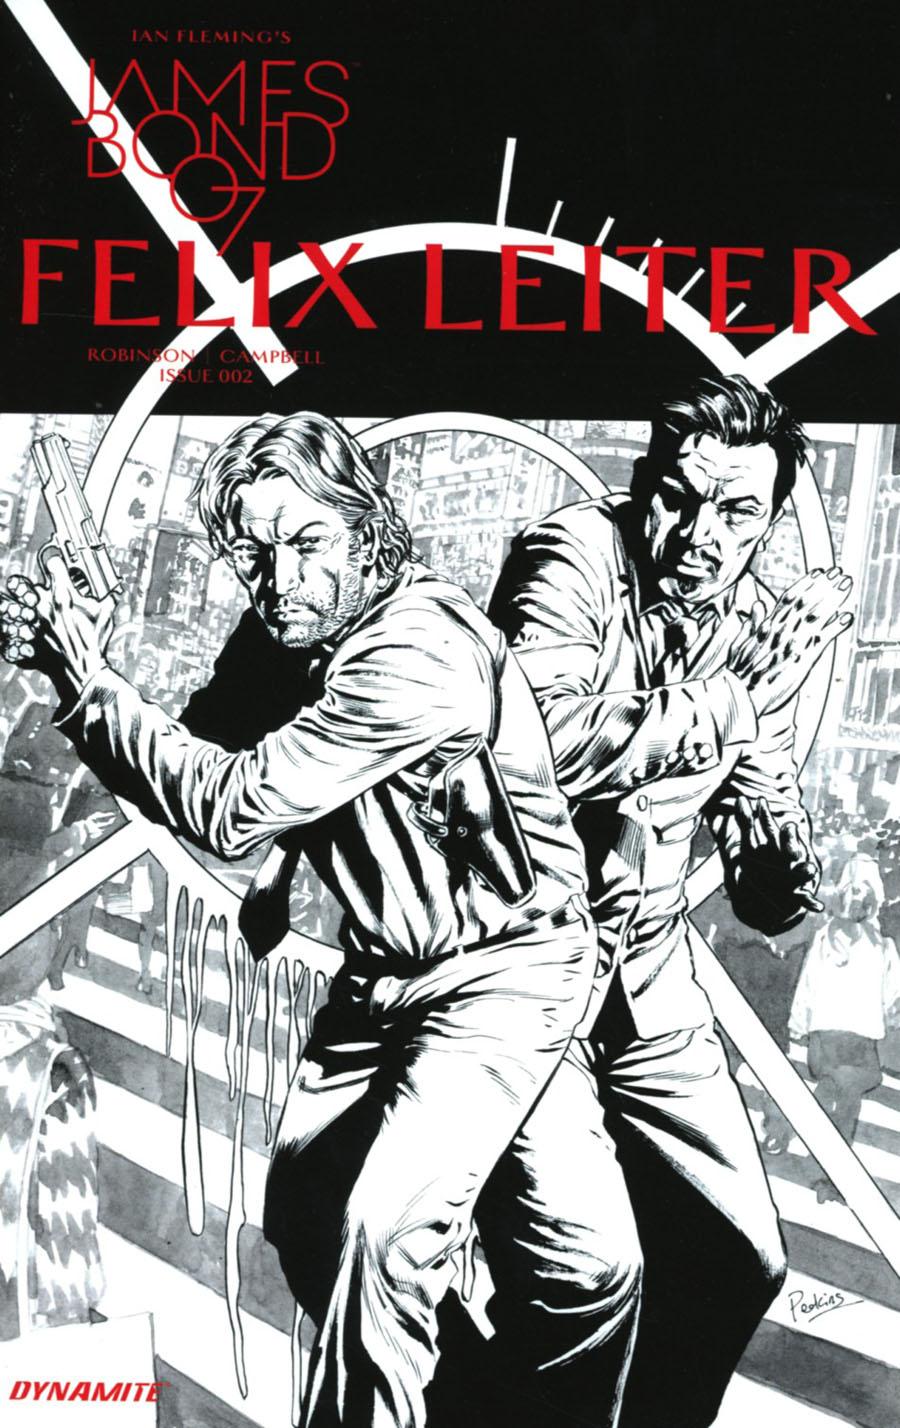 James Bond Felix Leiter #2 Cover B Incentive Mike Perkins Black & White Cover